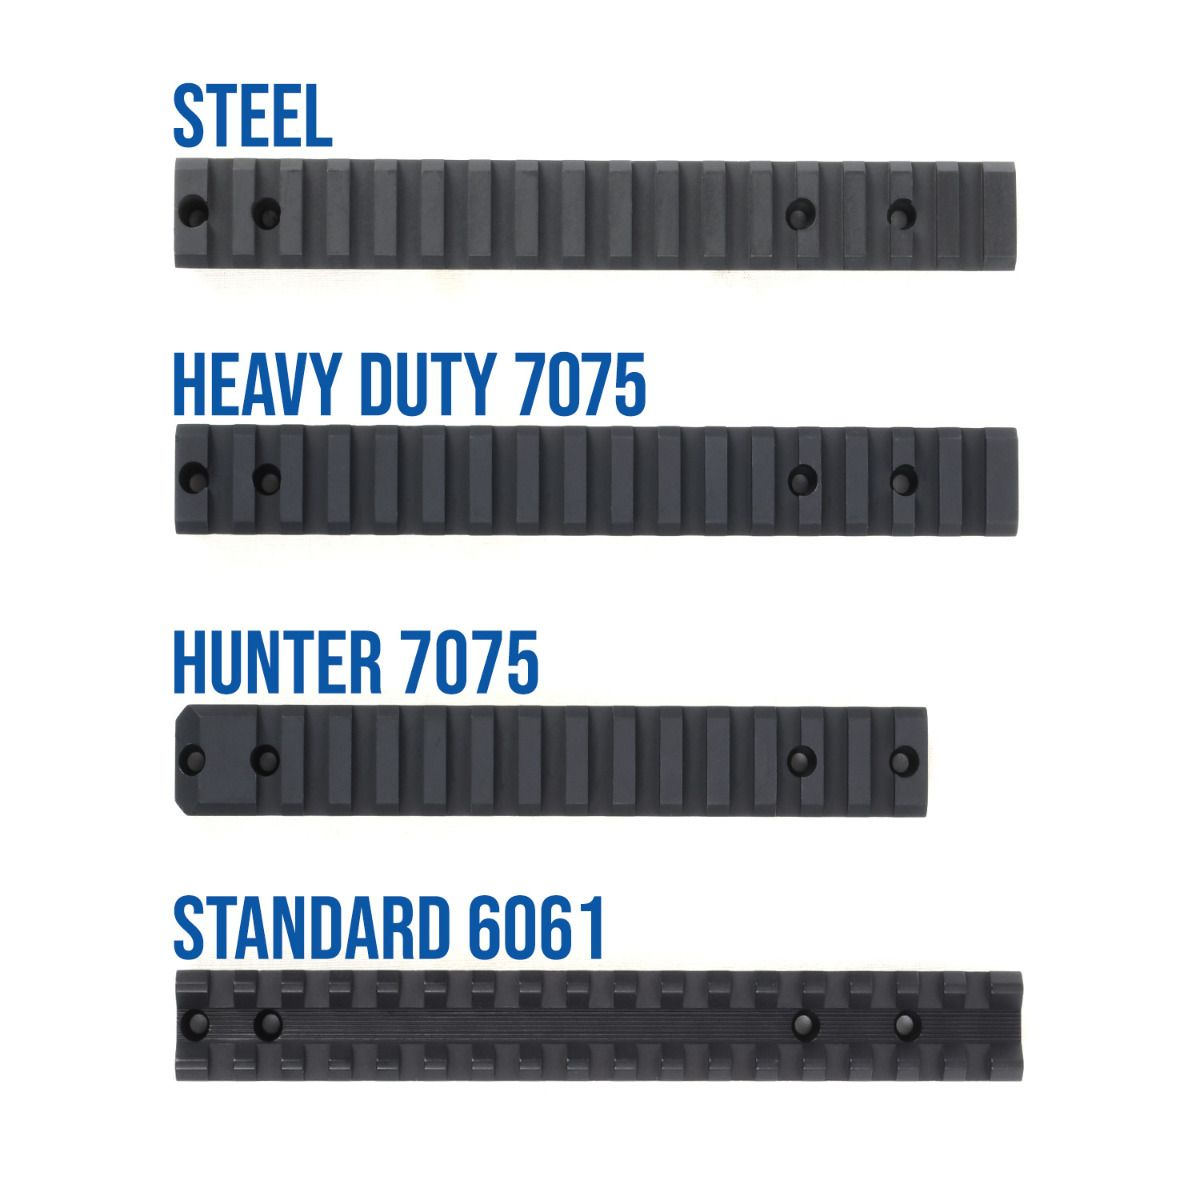 Hunter Series Remington 700, 721, 725, Sauer 100/101, Bergara B14 Long Action Picatinny Rail 0 MOA